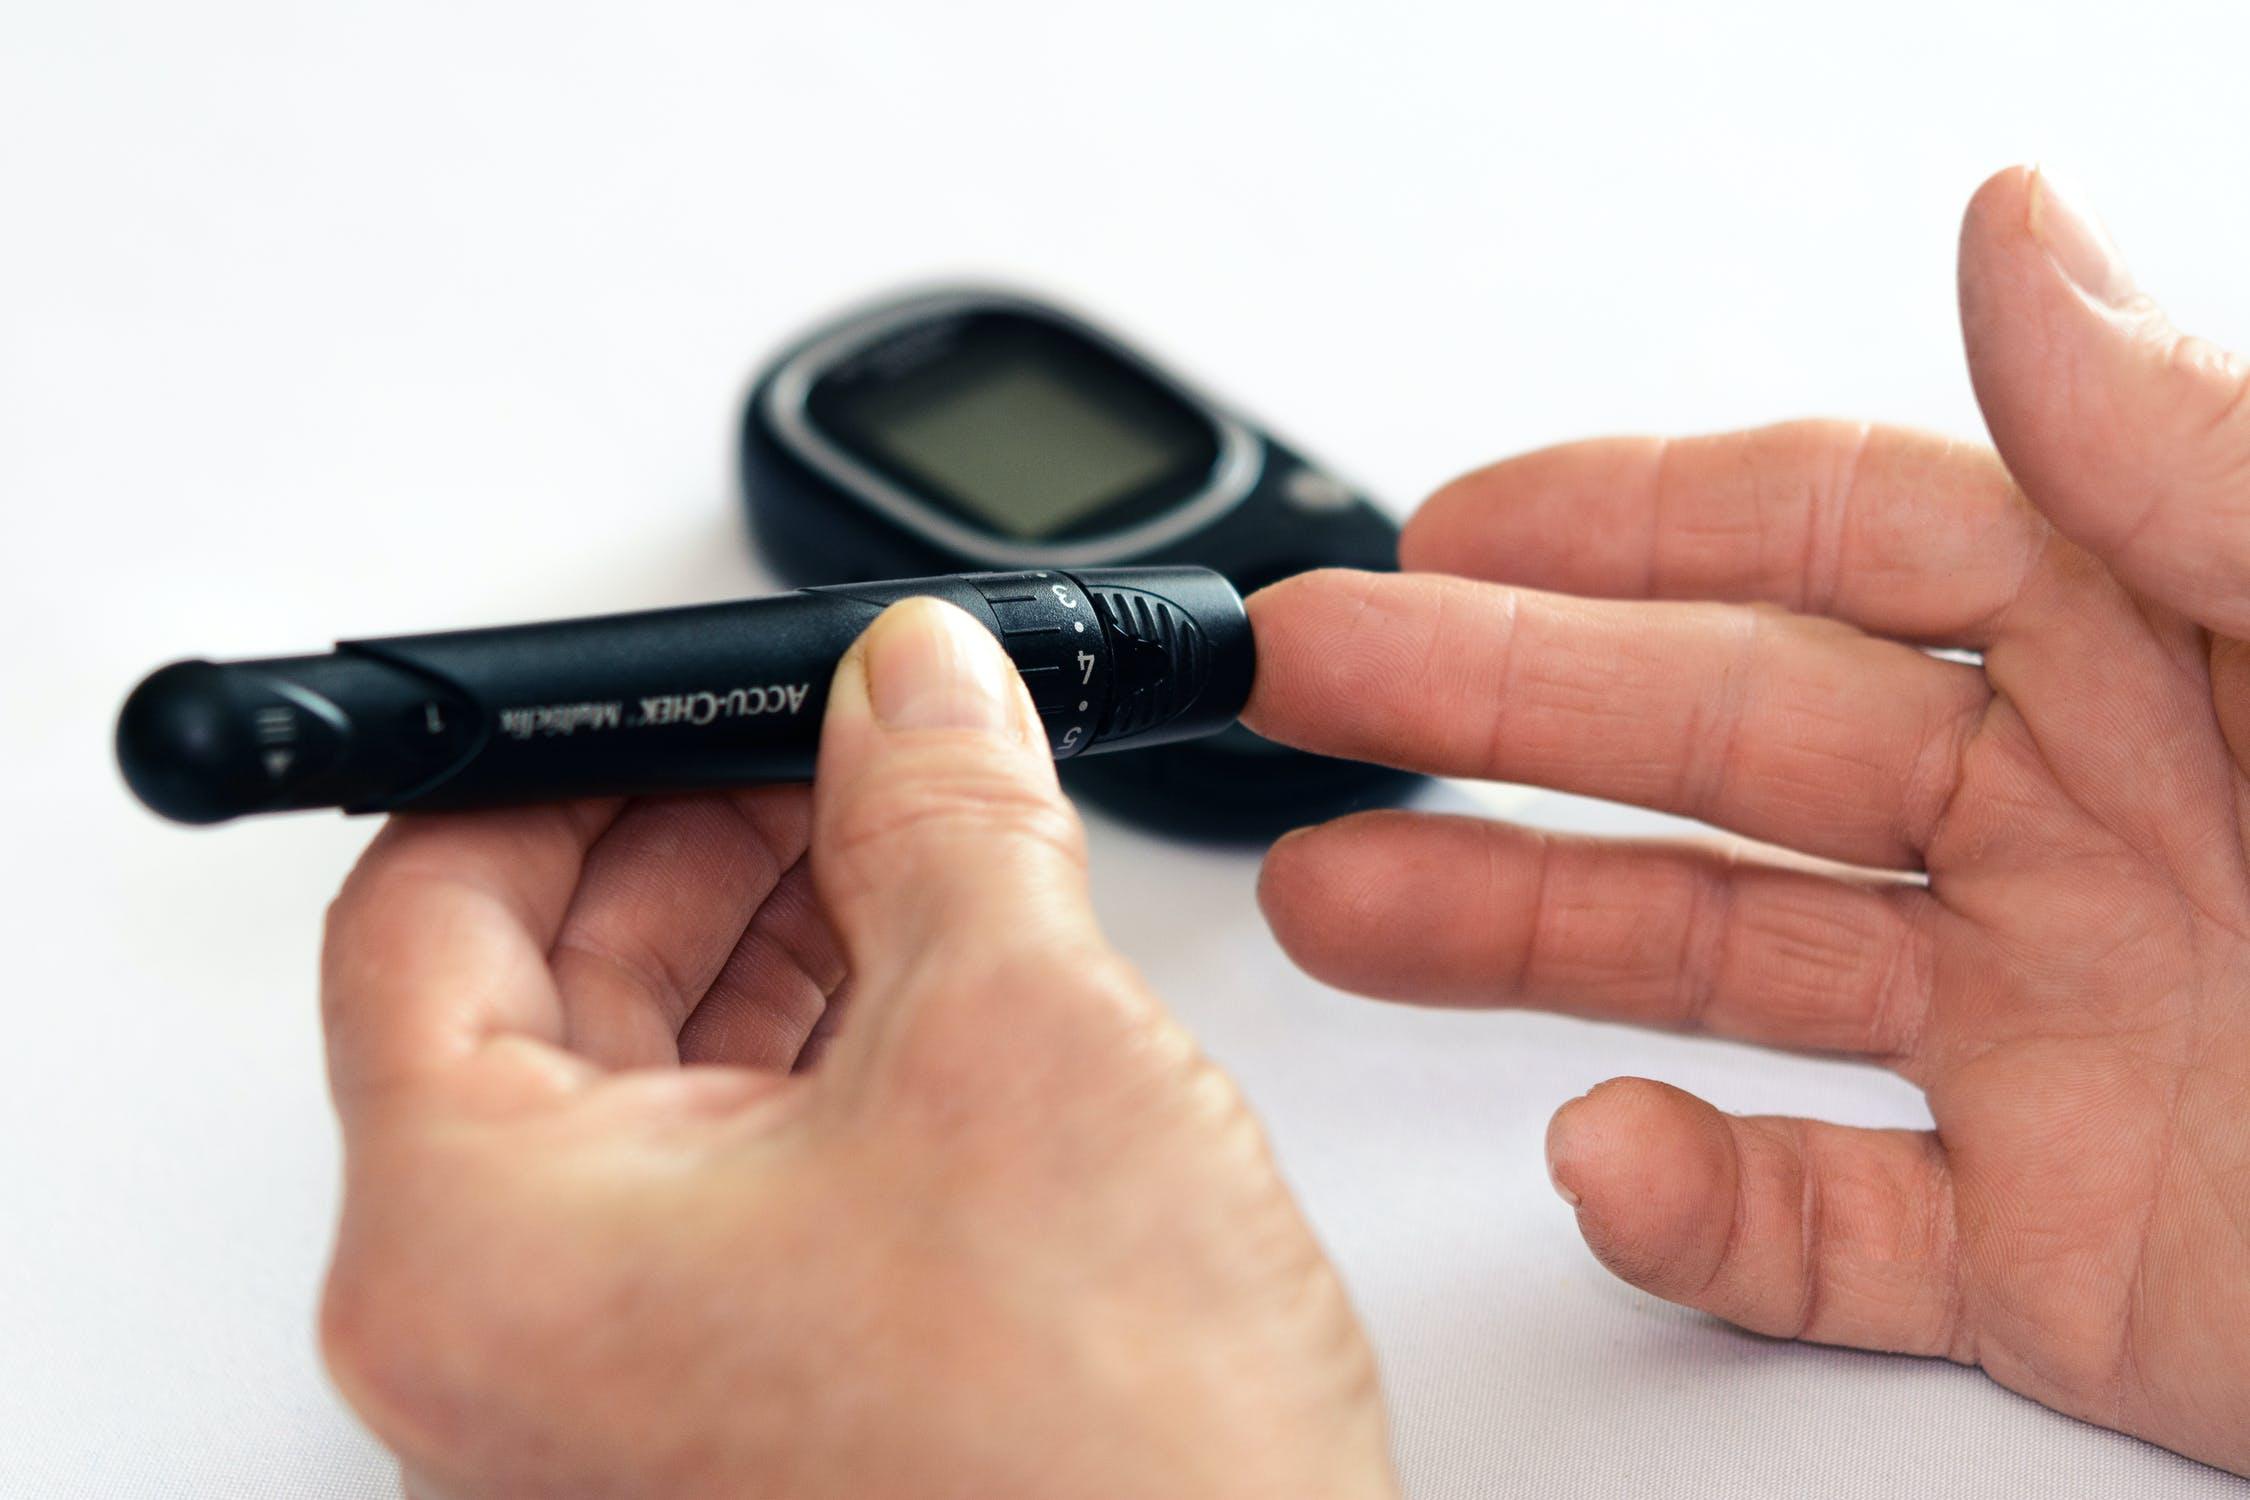 cgm cukorbetegség